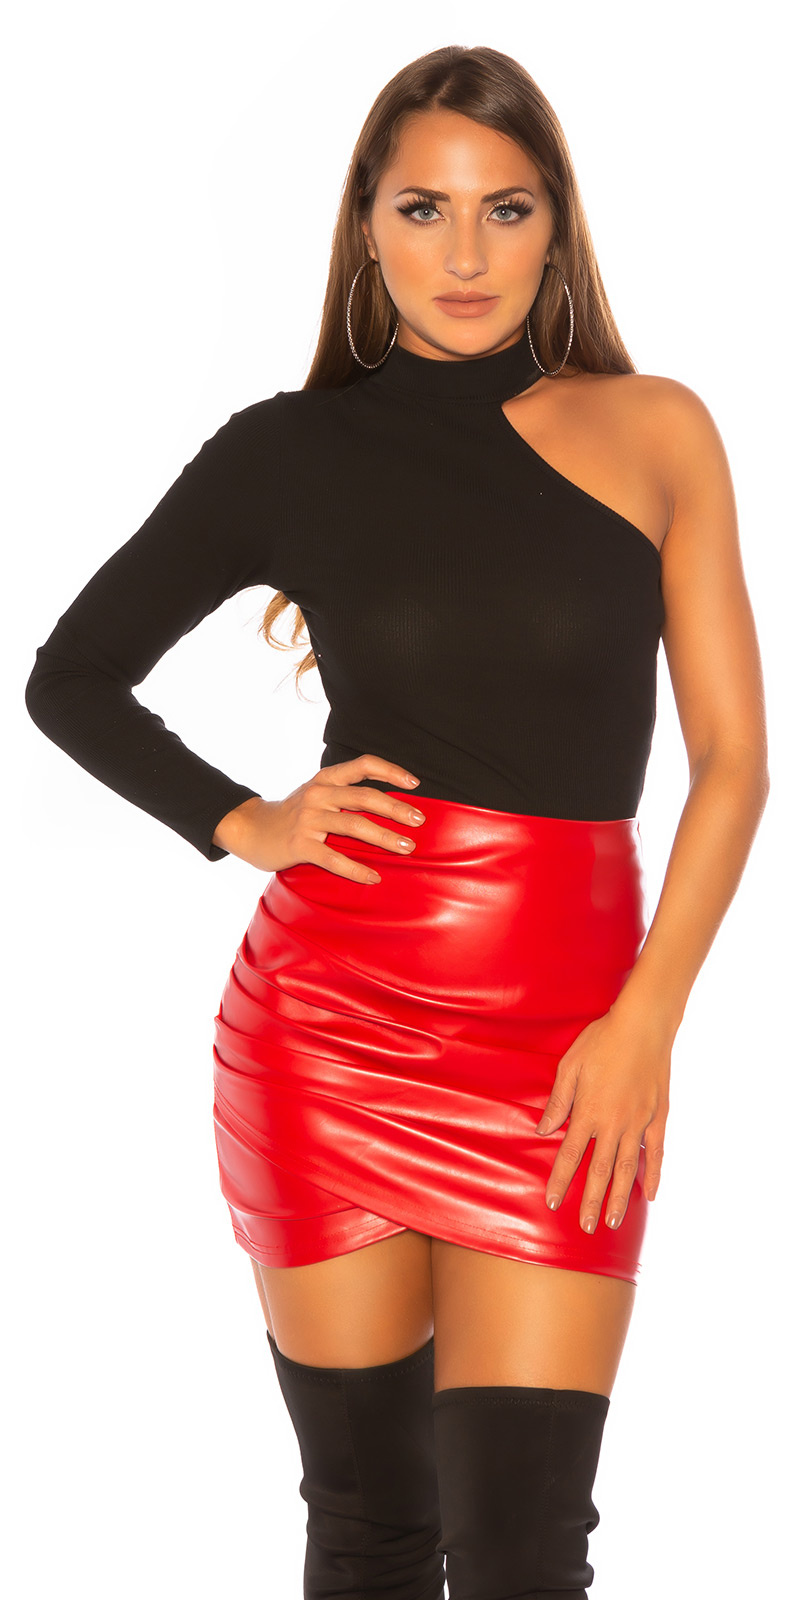 Koucla Leather Look Skirt Faux Leather Mini Skirt Ruffle